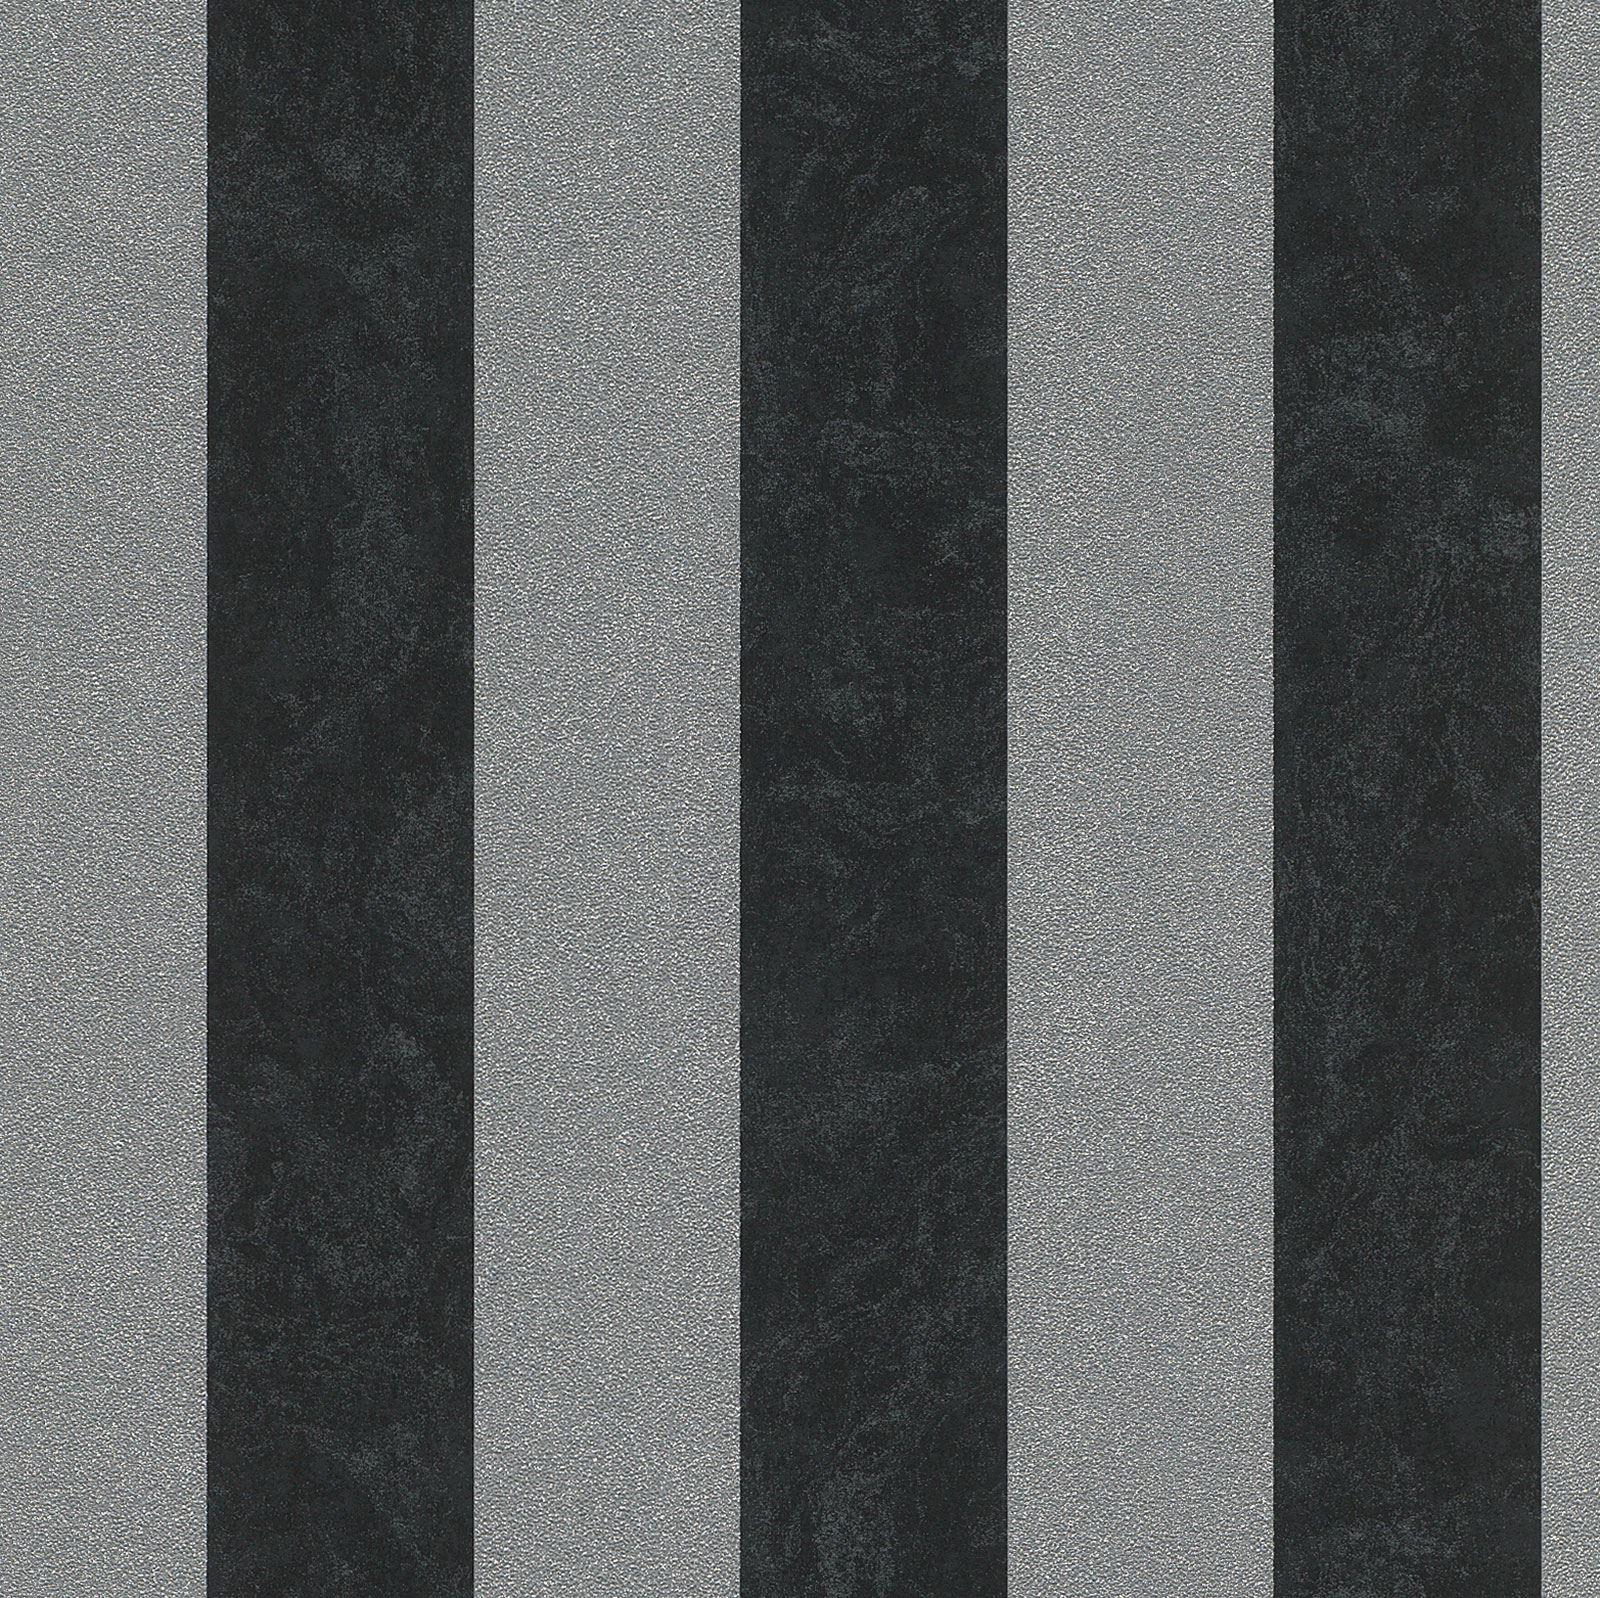 PS Carat Glitter Stripe Wallpaper 13346 40 Black Silver Feature